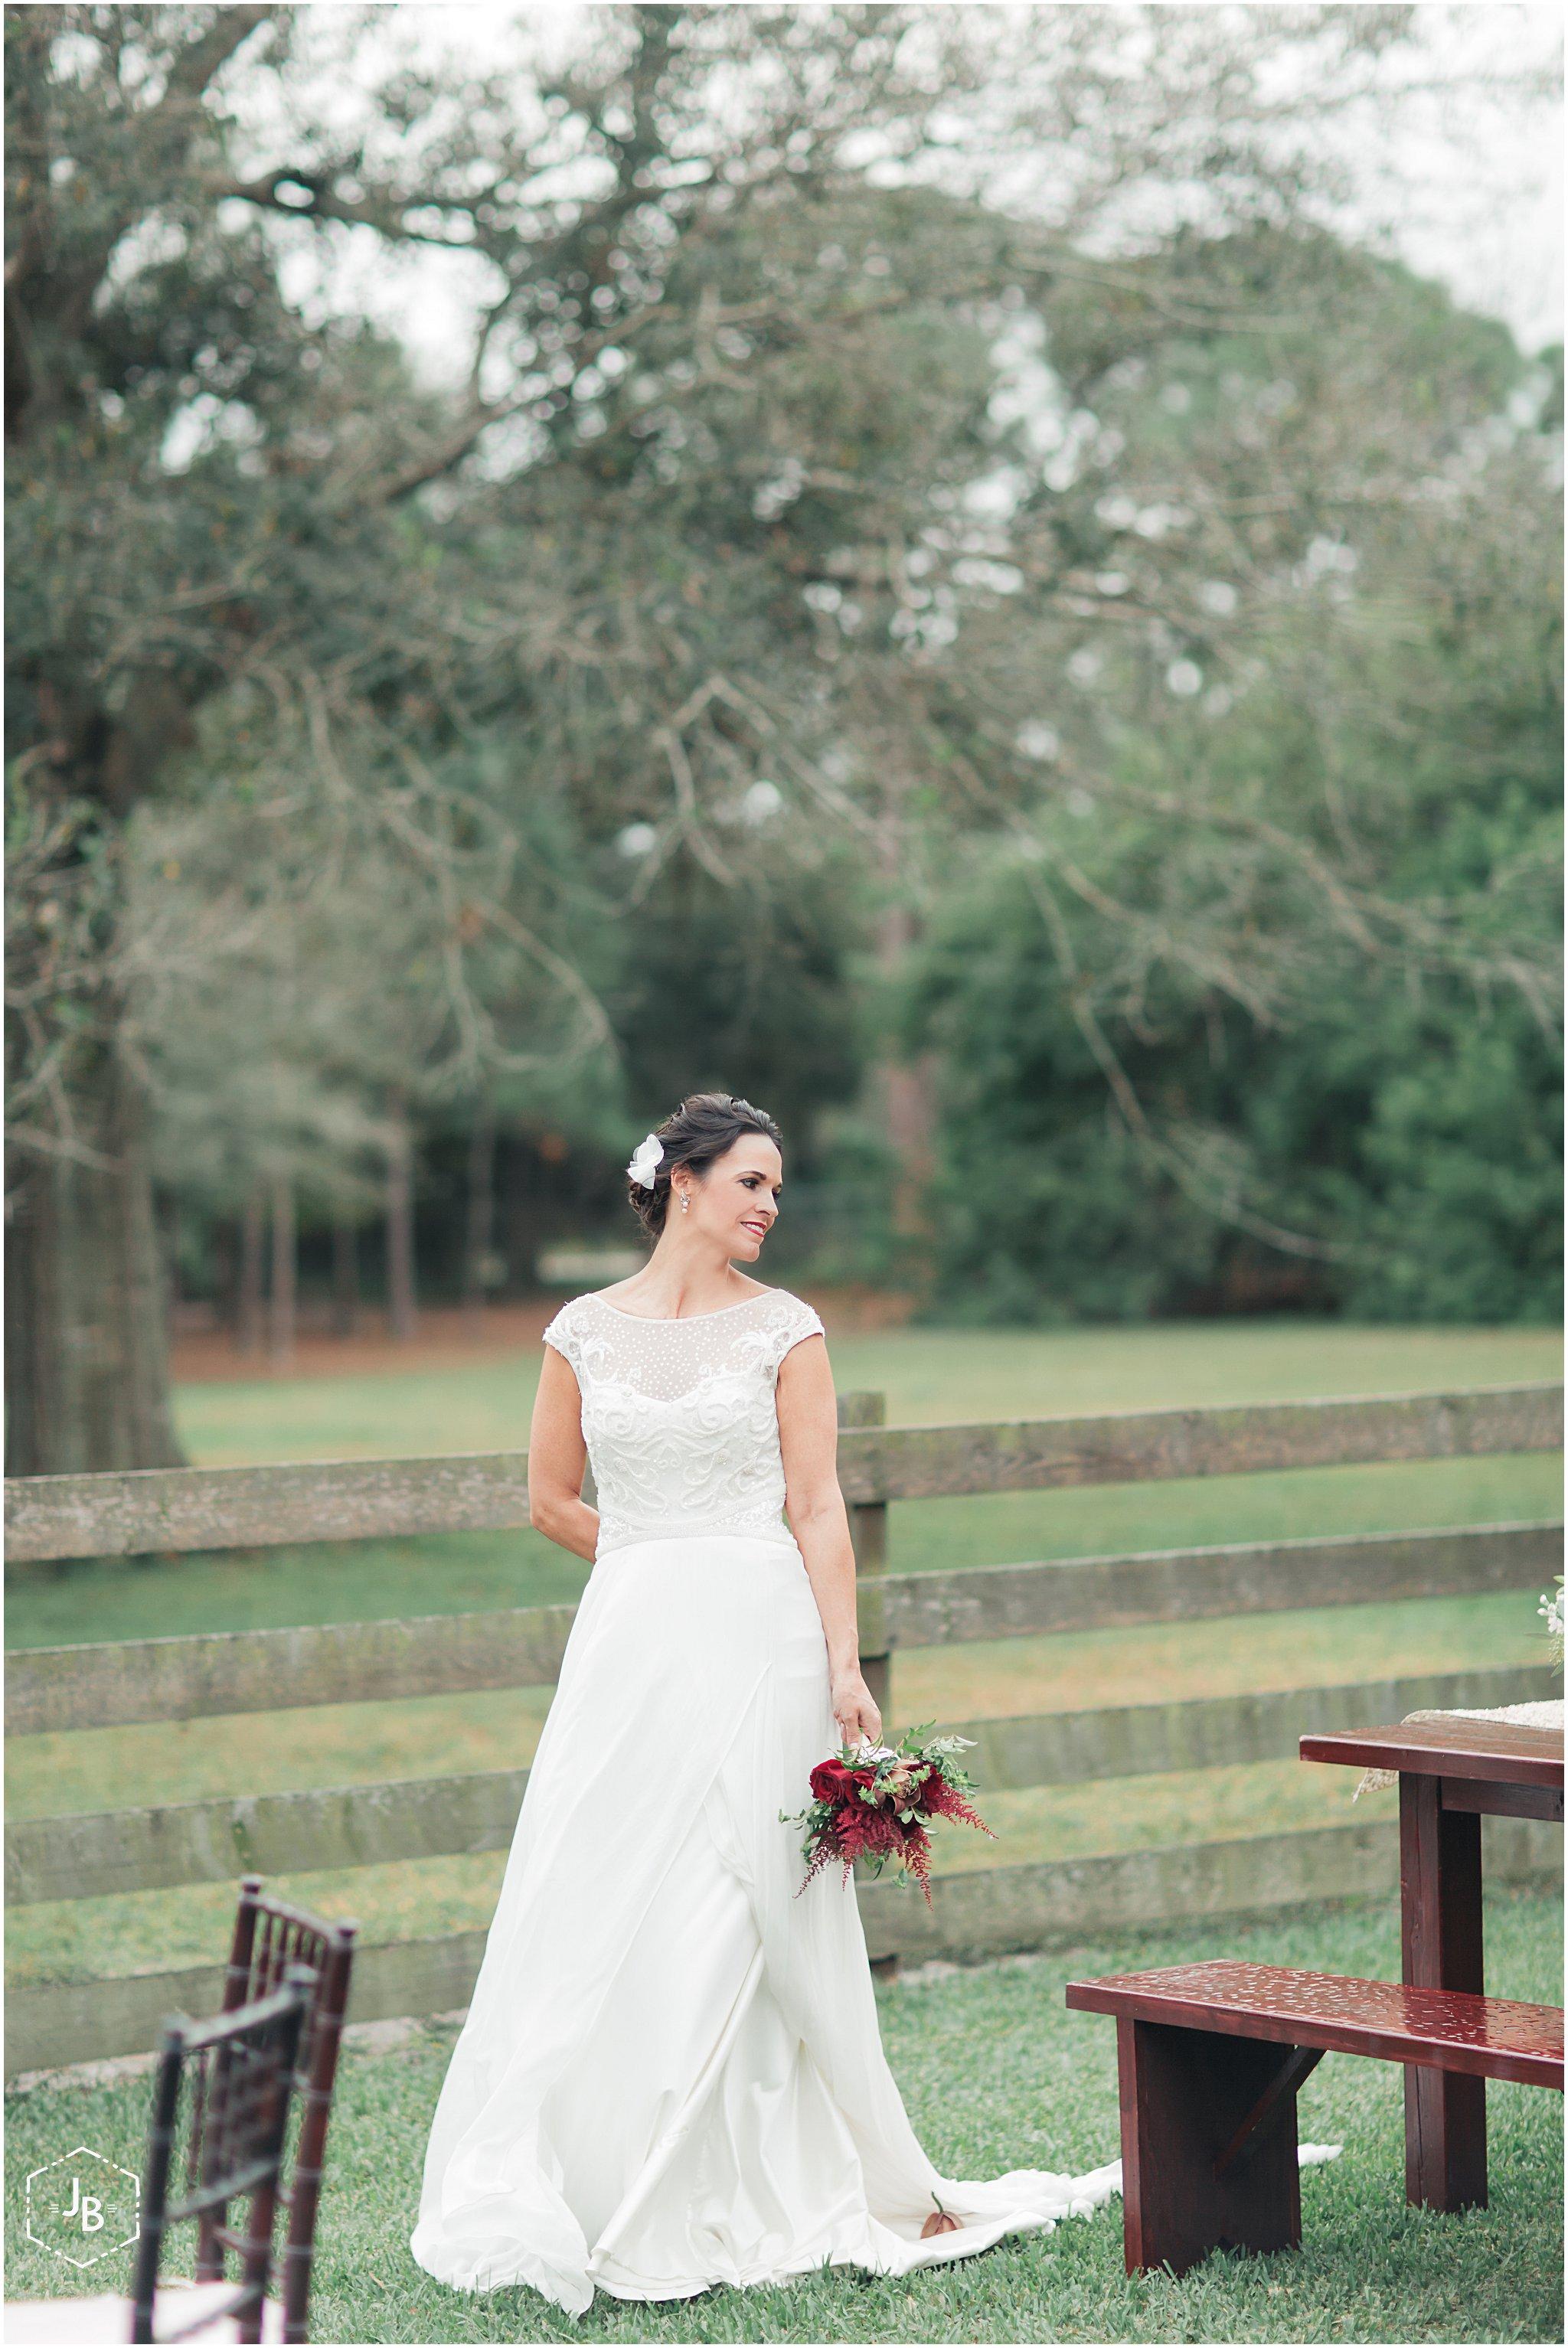 WeddingandEngagementFloridaPhotographer_0452.jpg